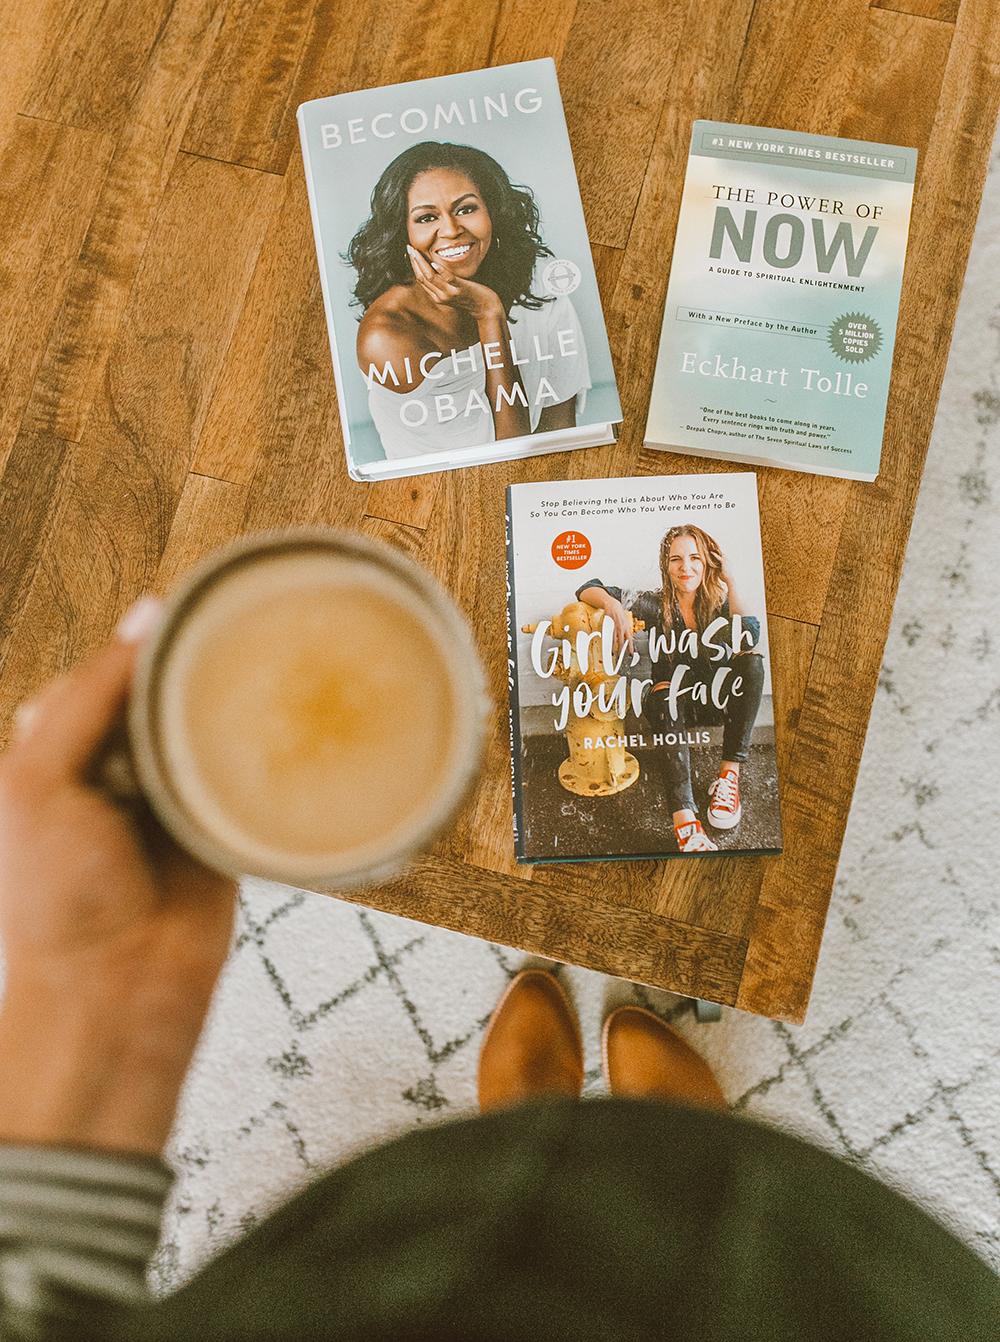 livvyland-blog-olivia-watson-austin-texas-lifestyle-blogger-best-inspiring-books-2018-2019-1